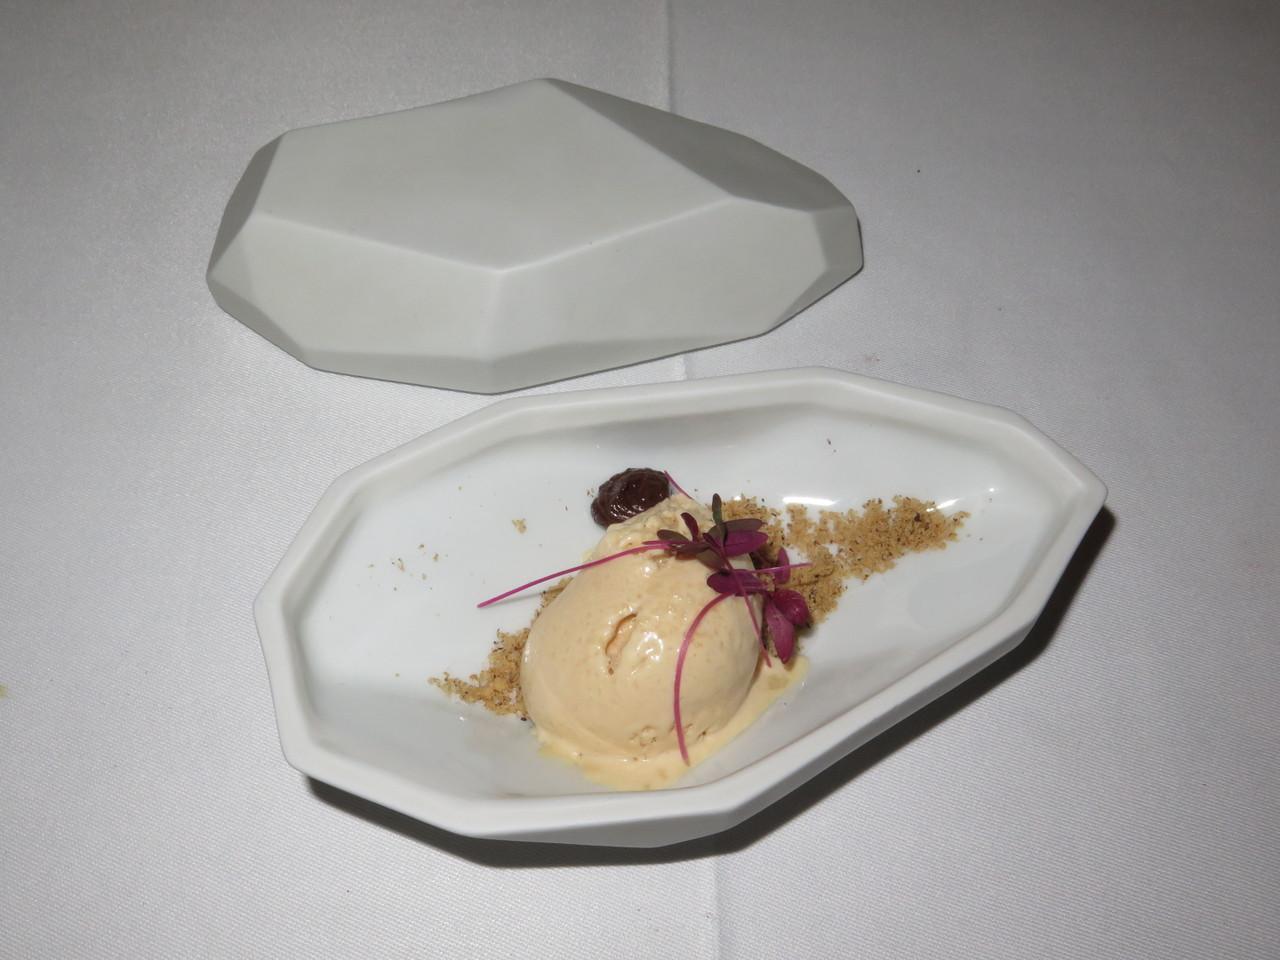 Foie gras e cogumelos... à sobremesa!